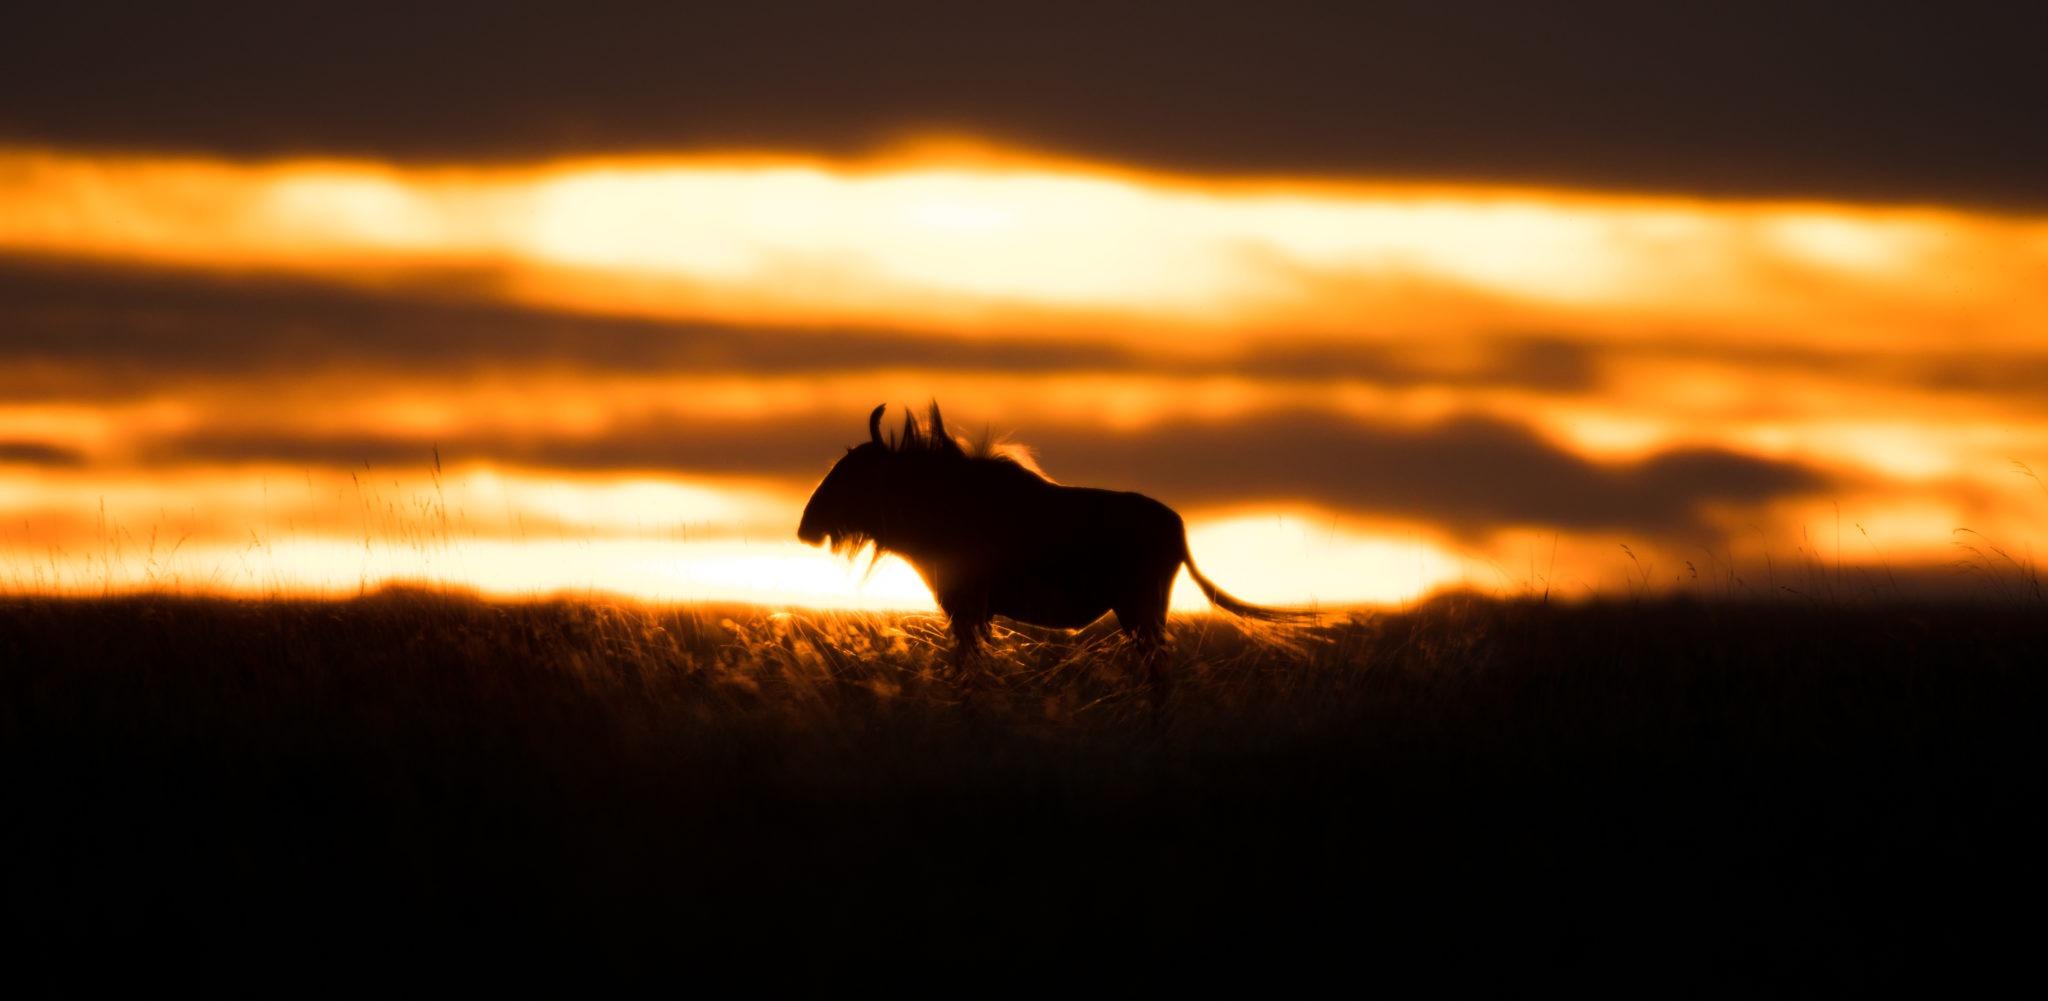 luiwa wildebeest sunset